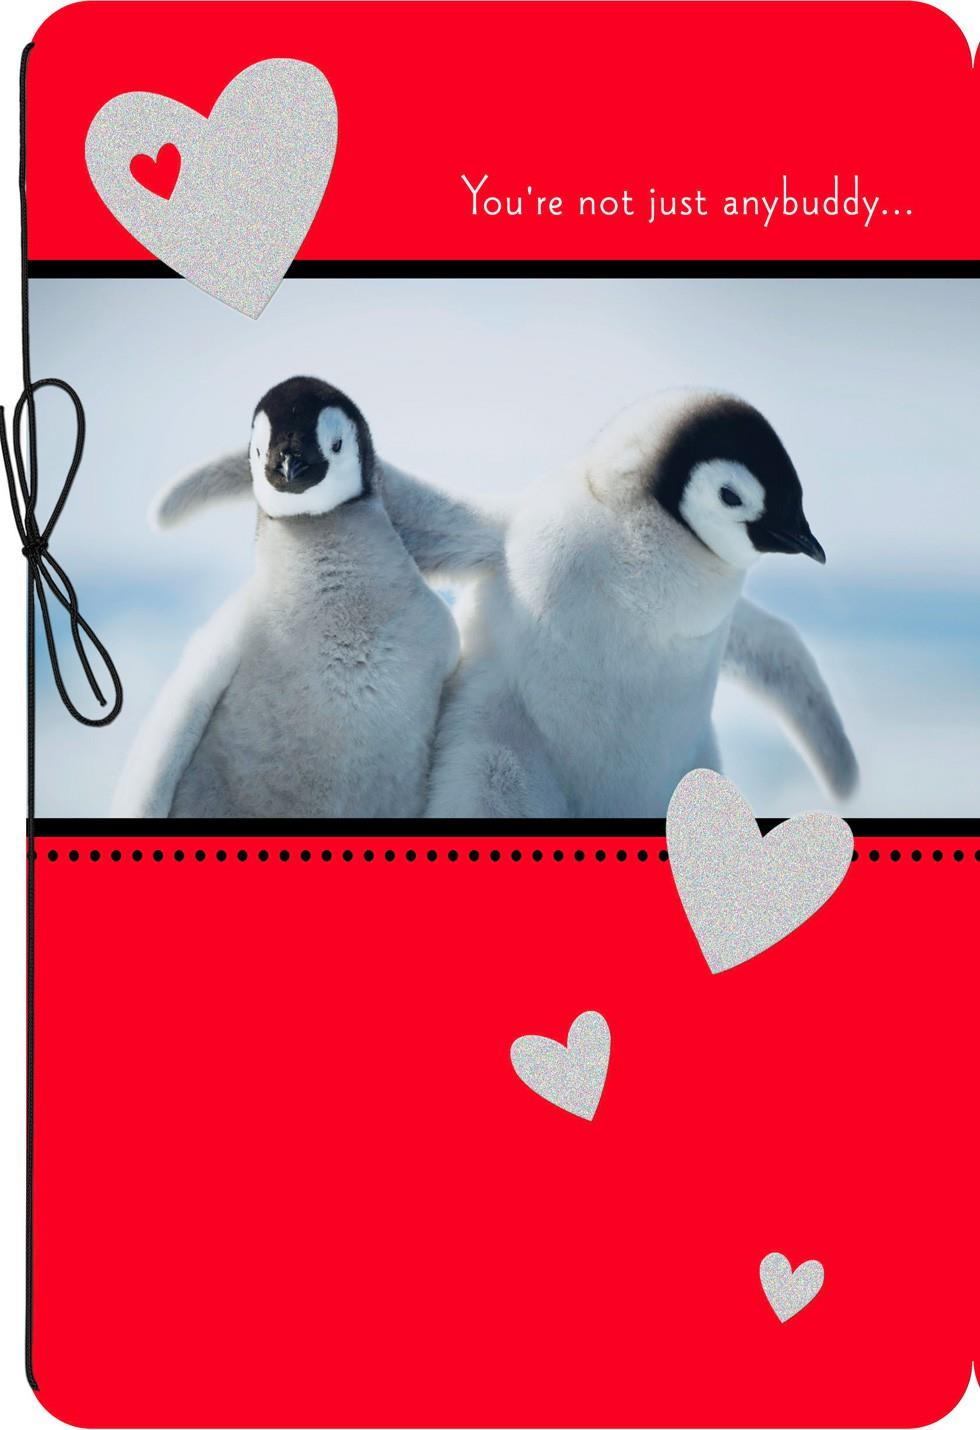 Best Friend Penguins Valentines Day Card Greeting Cards Hallmark – Valentines Day Card for Best Friend